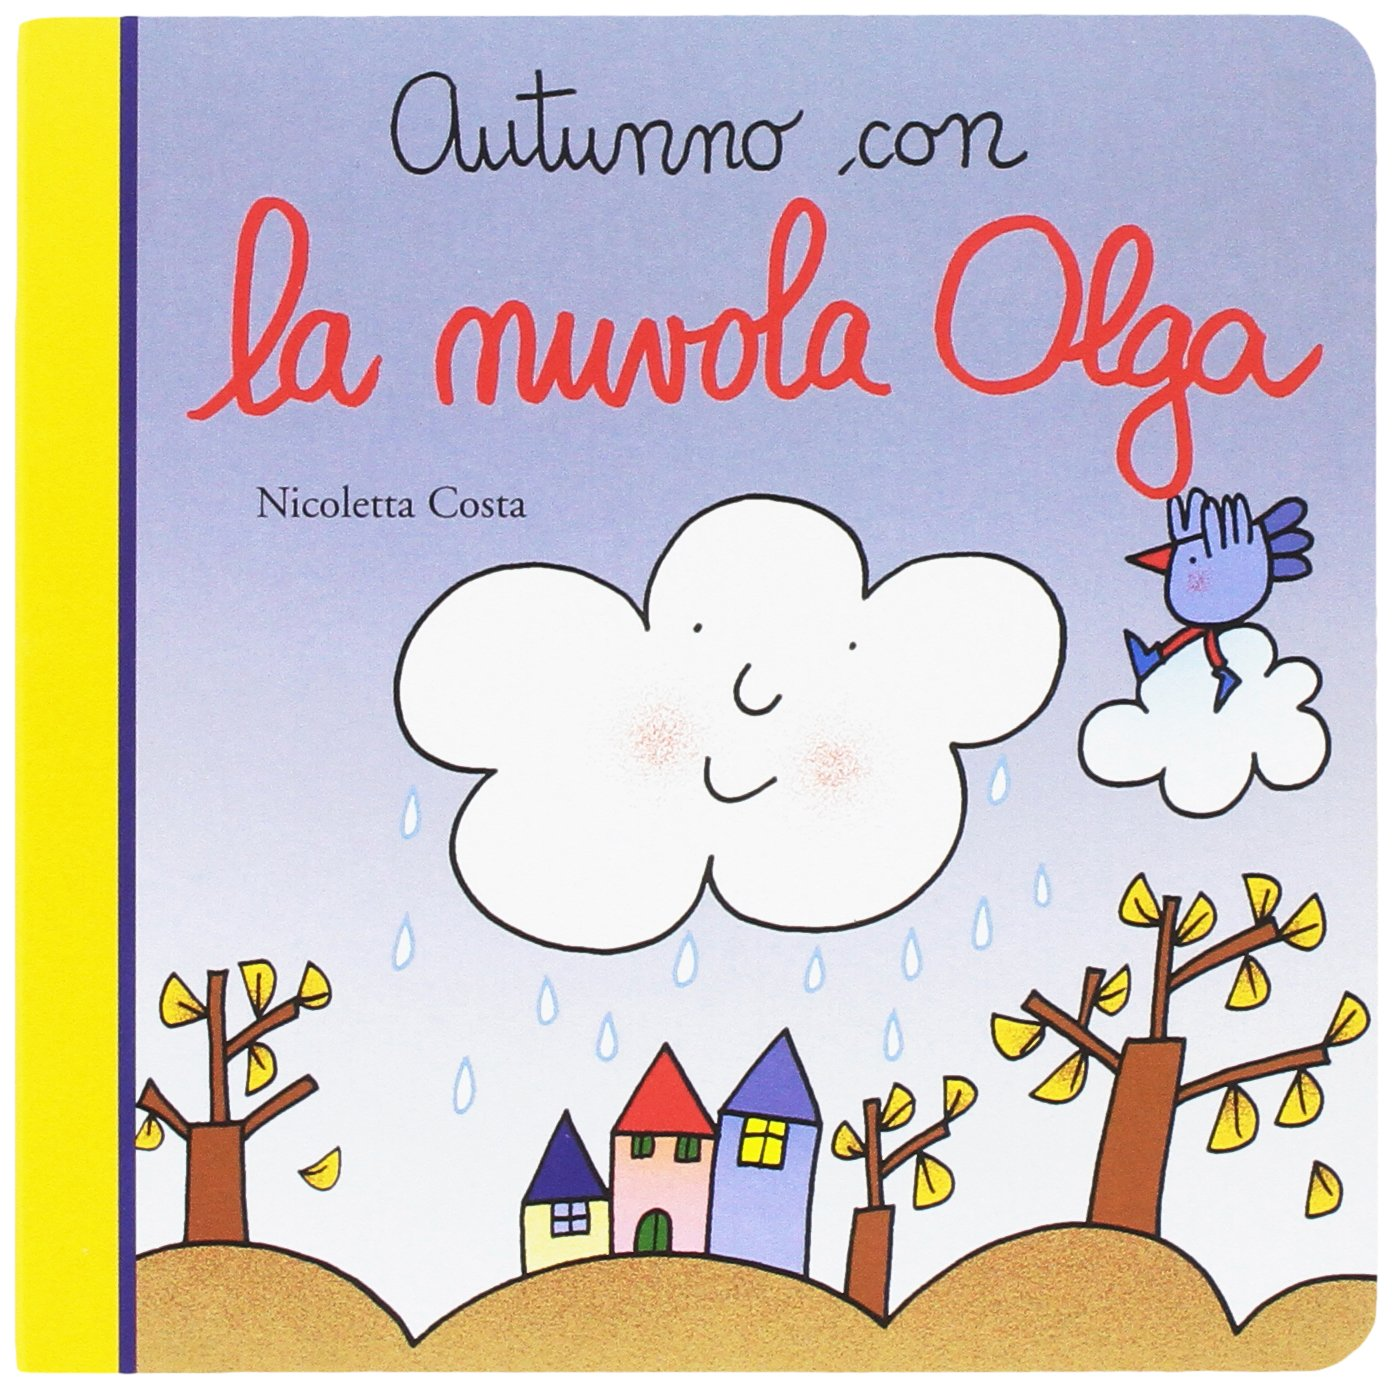 Ben noto Amazon.it: Autunno con la nuvola Olga. Ediz. a colori - Nicoletta  RS37